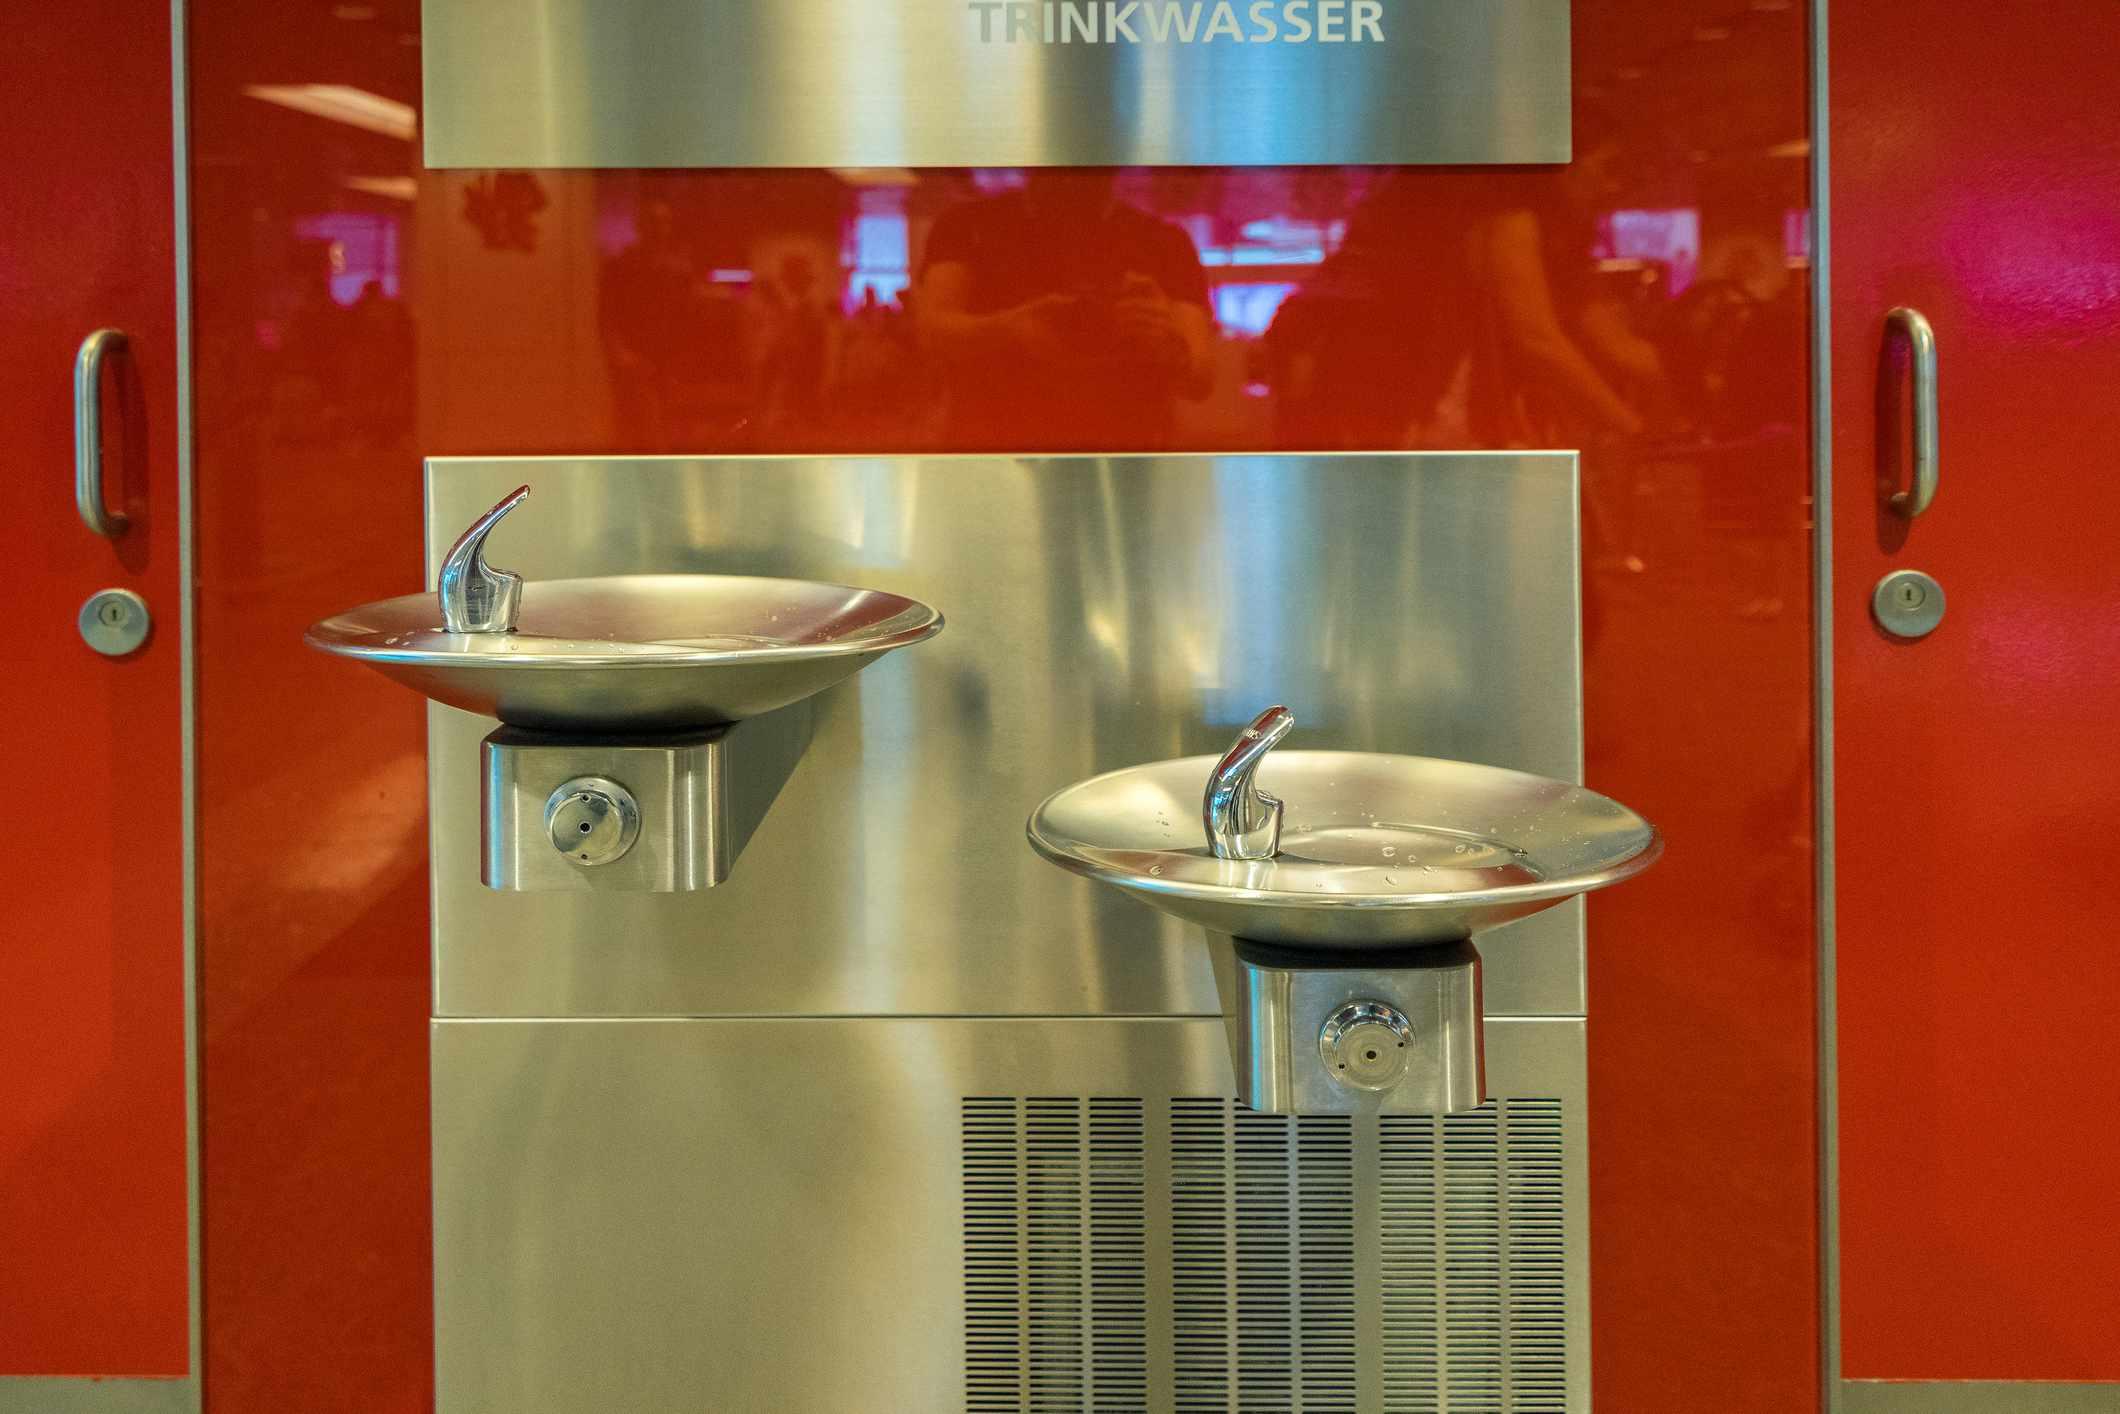 Water fountain at Changi Airport, Singapore